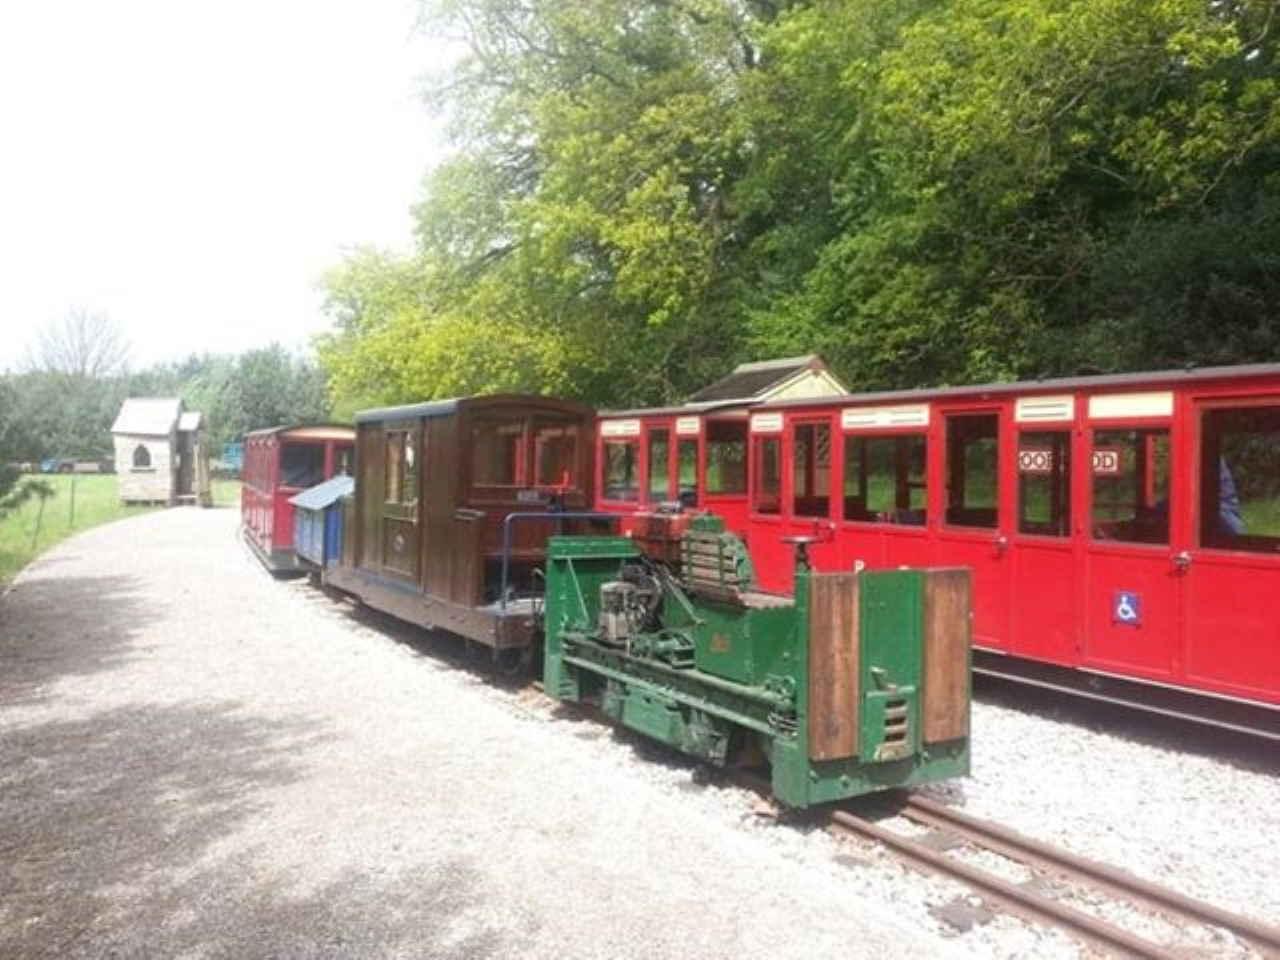 Lister locomotive